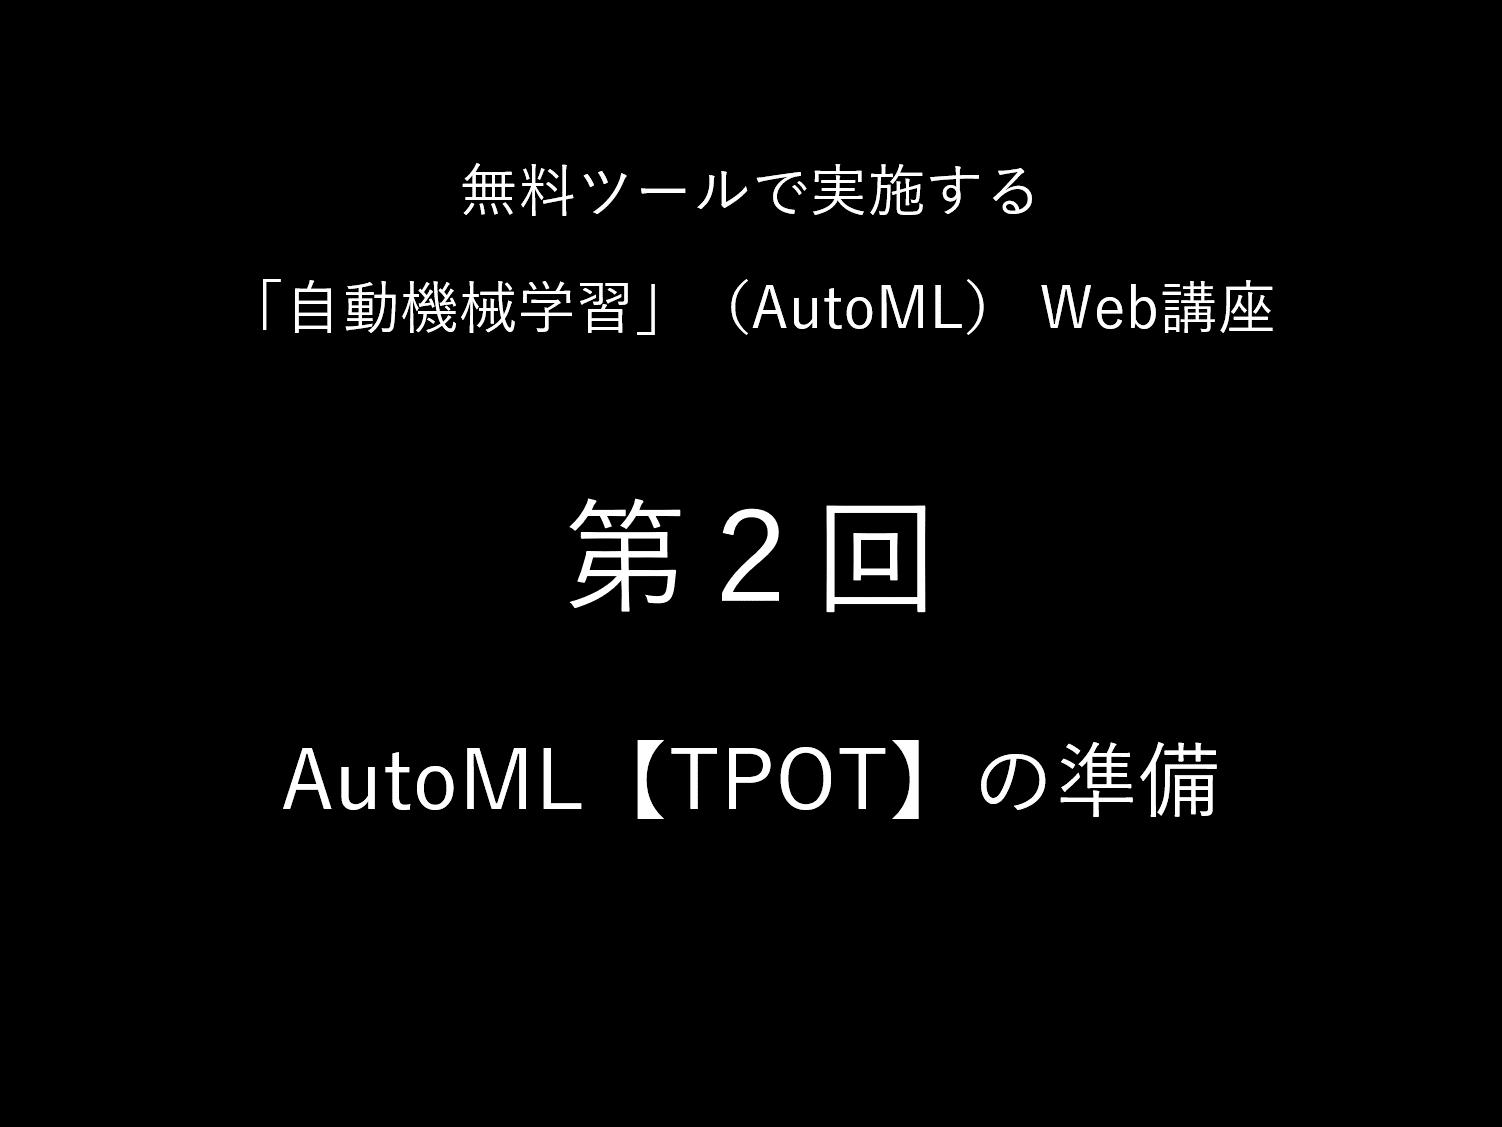 AutoML【TPOT】の準備